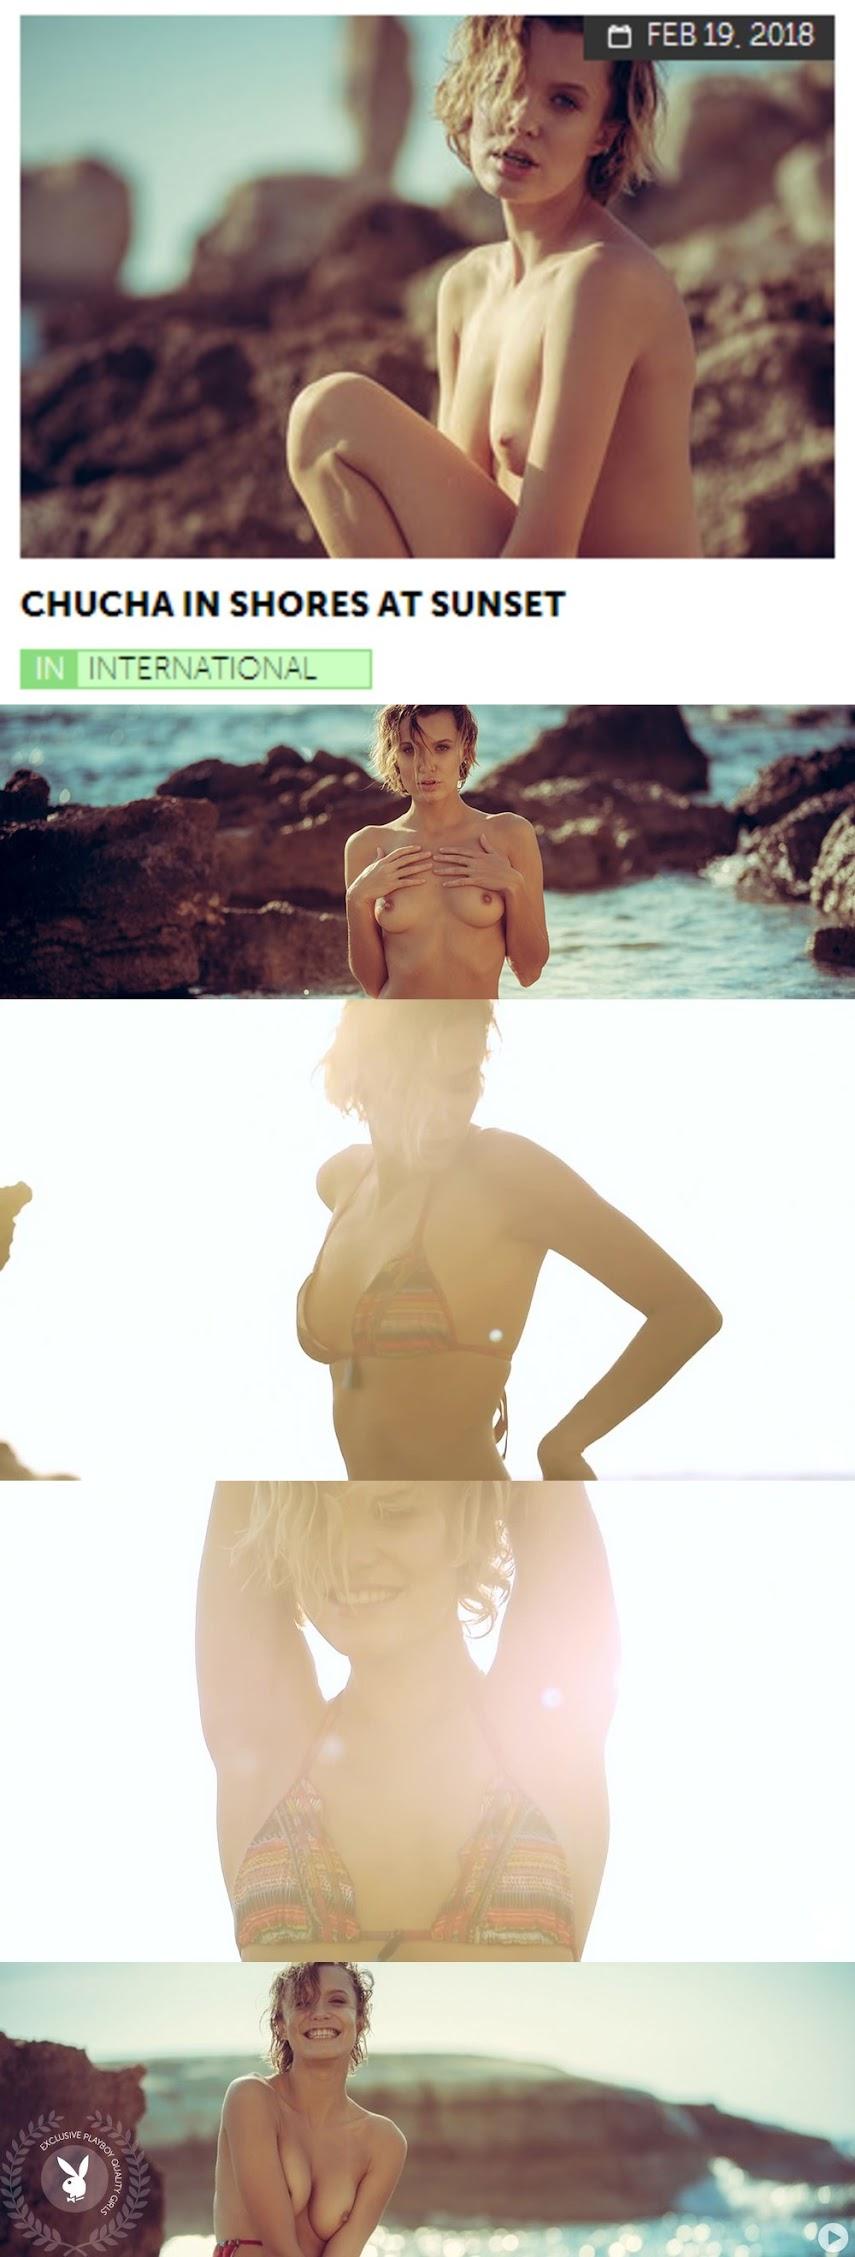 Playboy PlayboyPlus2018-02-19 Chucha in Shores at Sunset